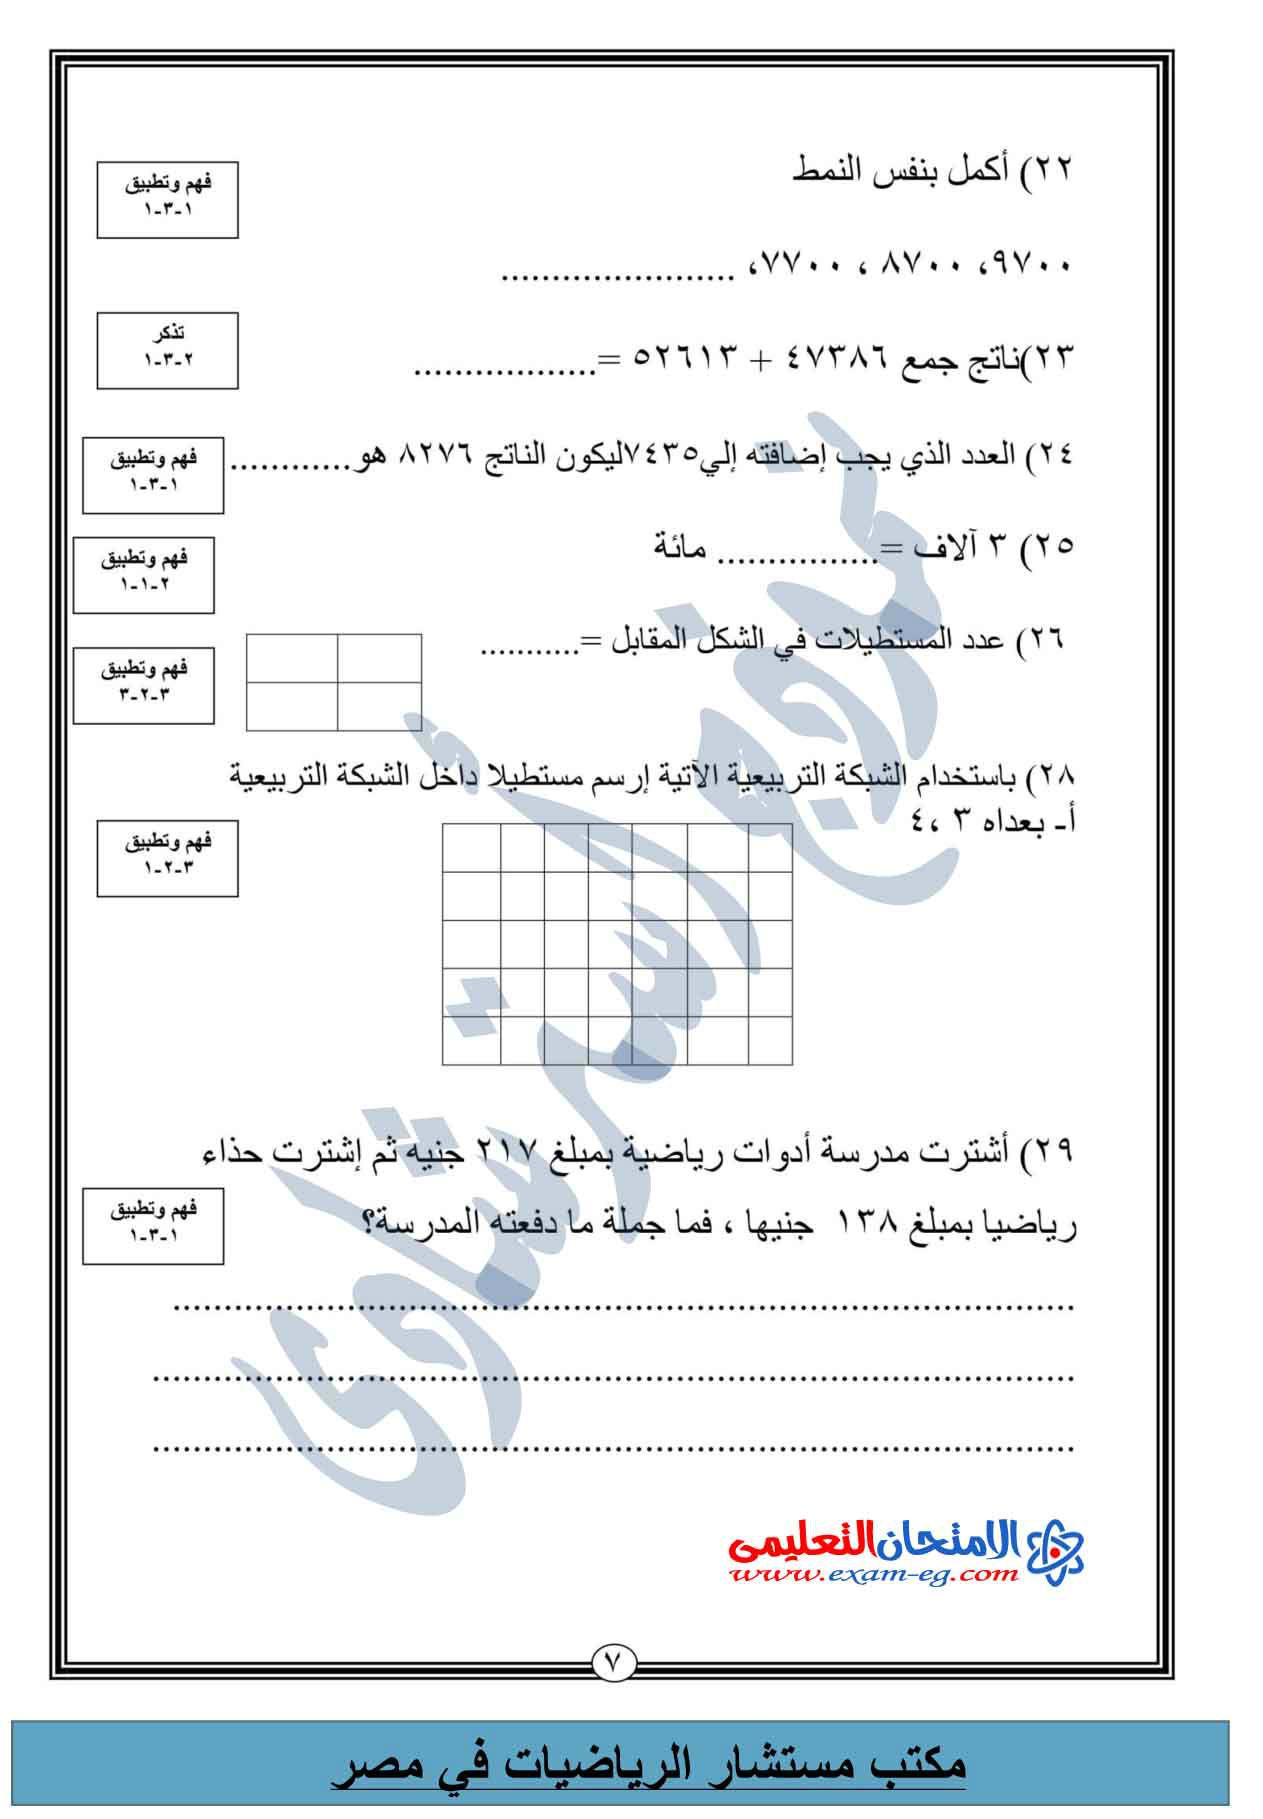 exam-eg.com_14492420351213.jpg